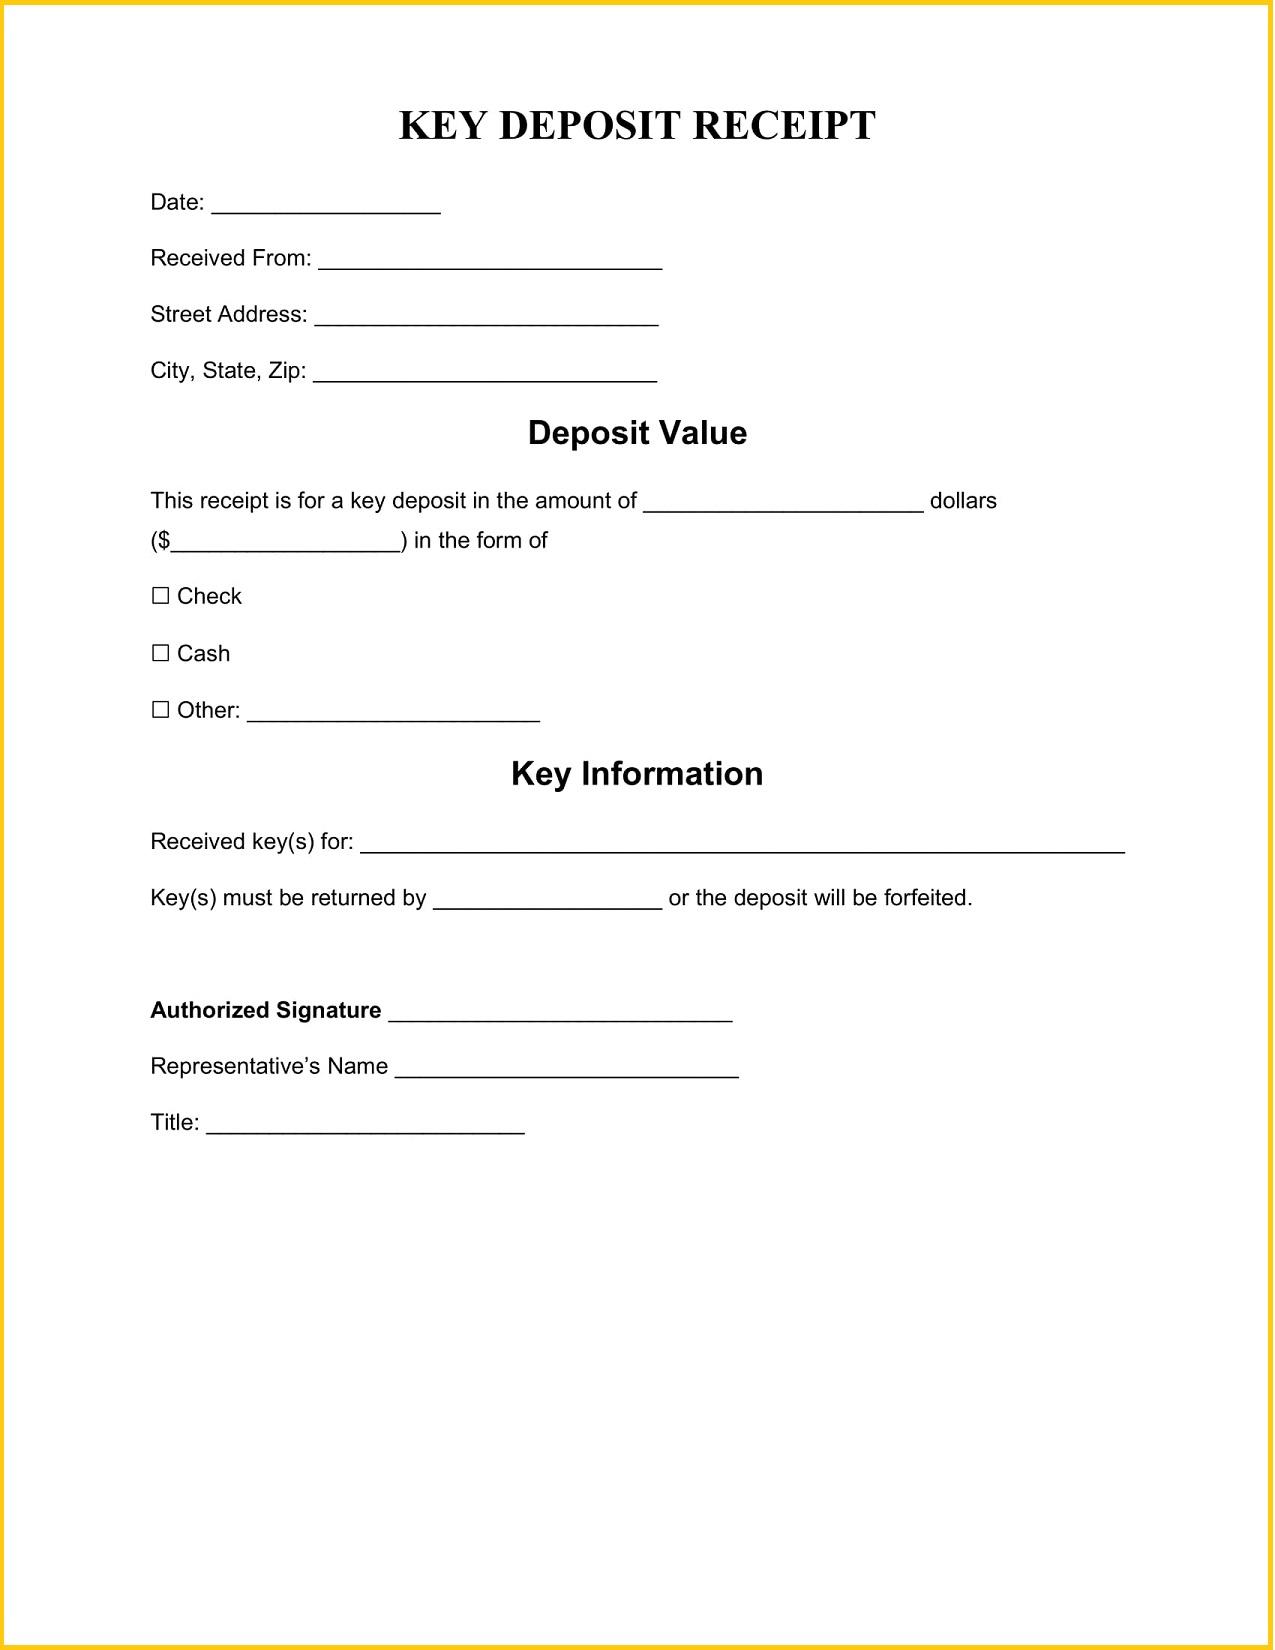 Key Deposit Receipt Template Word Free